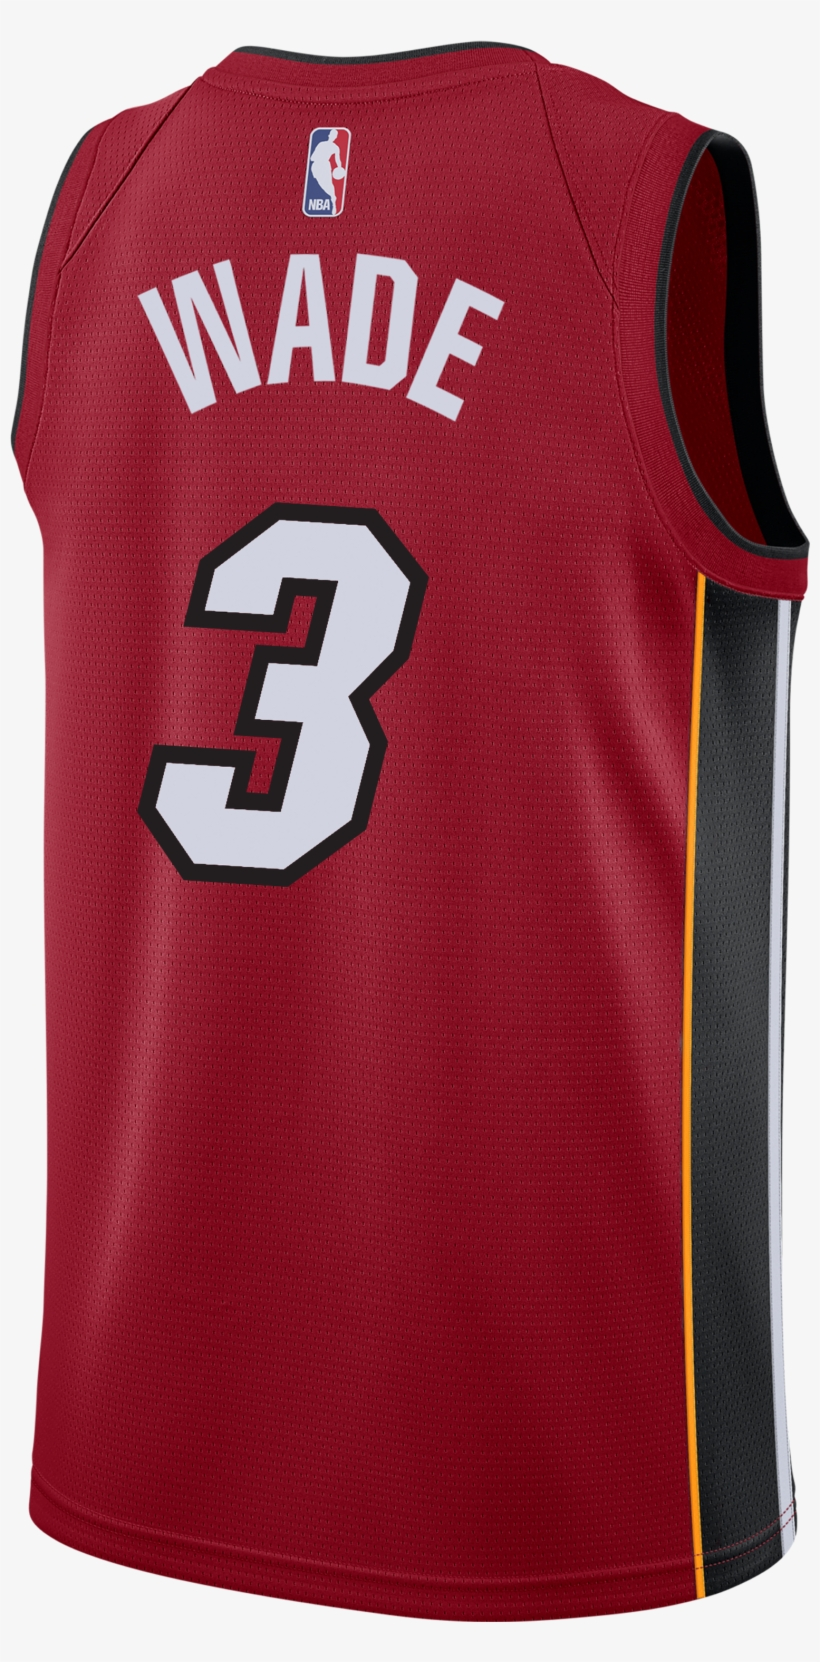 innovative design 2f98e 2c578 Dwyane Wade Nike Miami Heat Statement Red Swingman - Miami ...